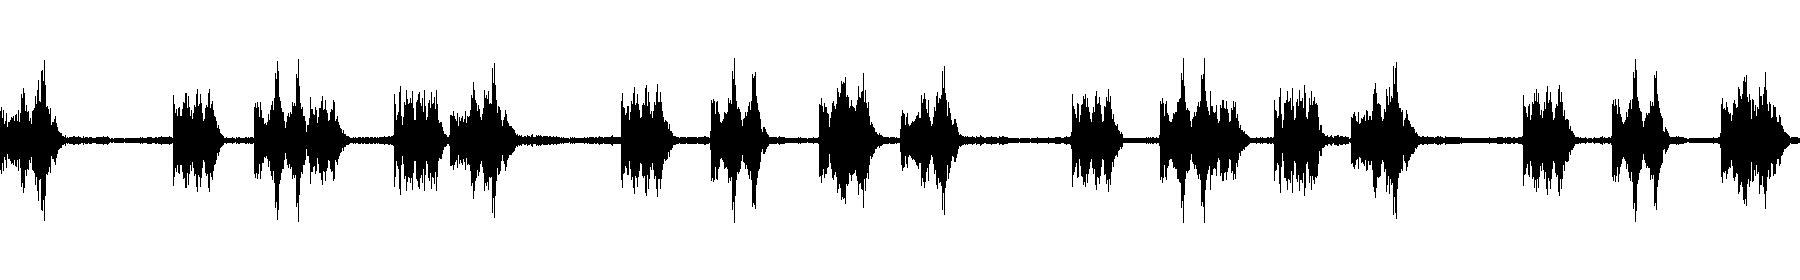 pth synth 15